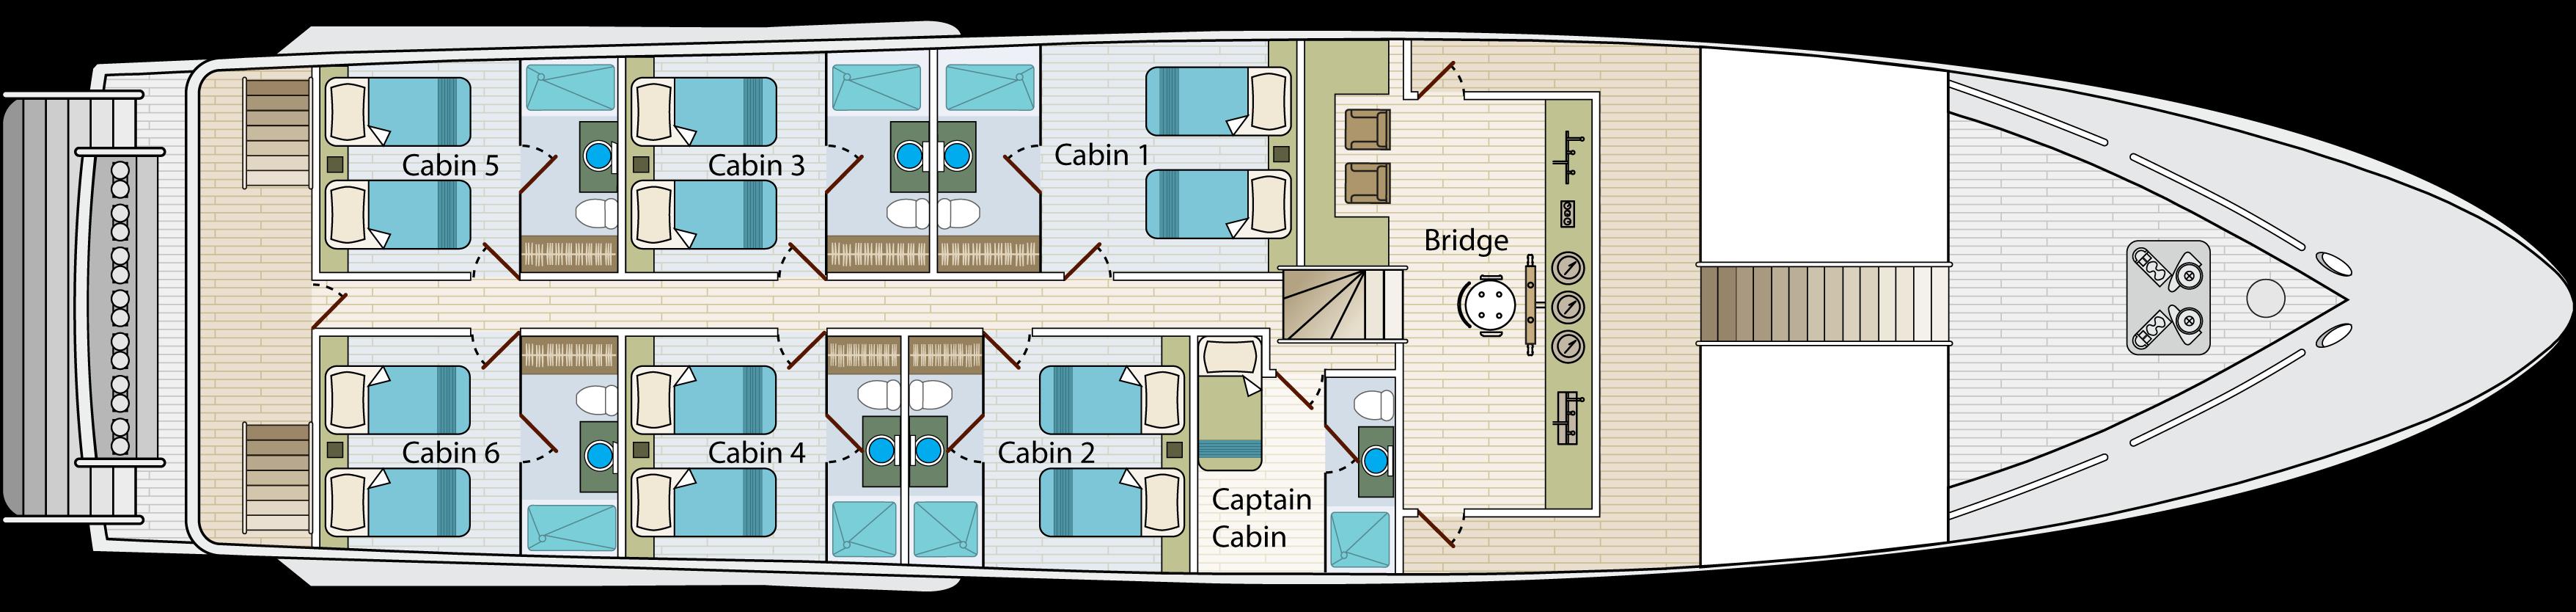 Upper deck   Calipso